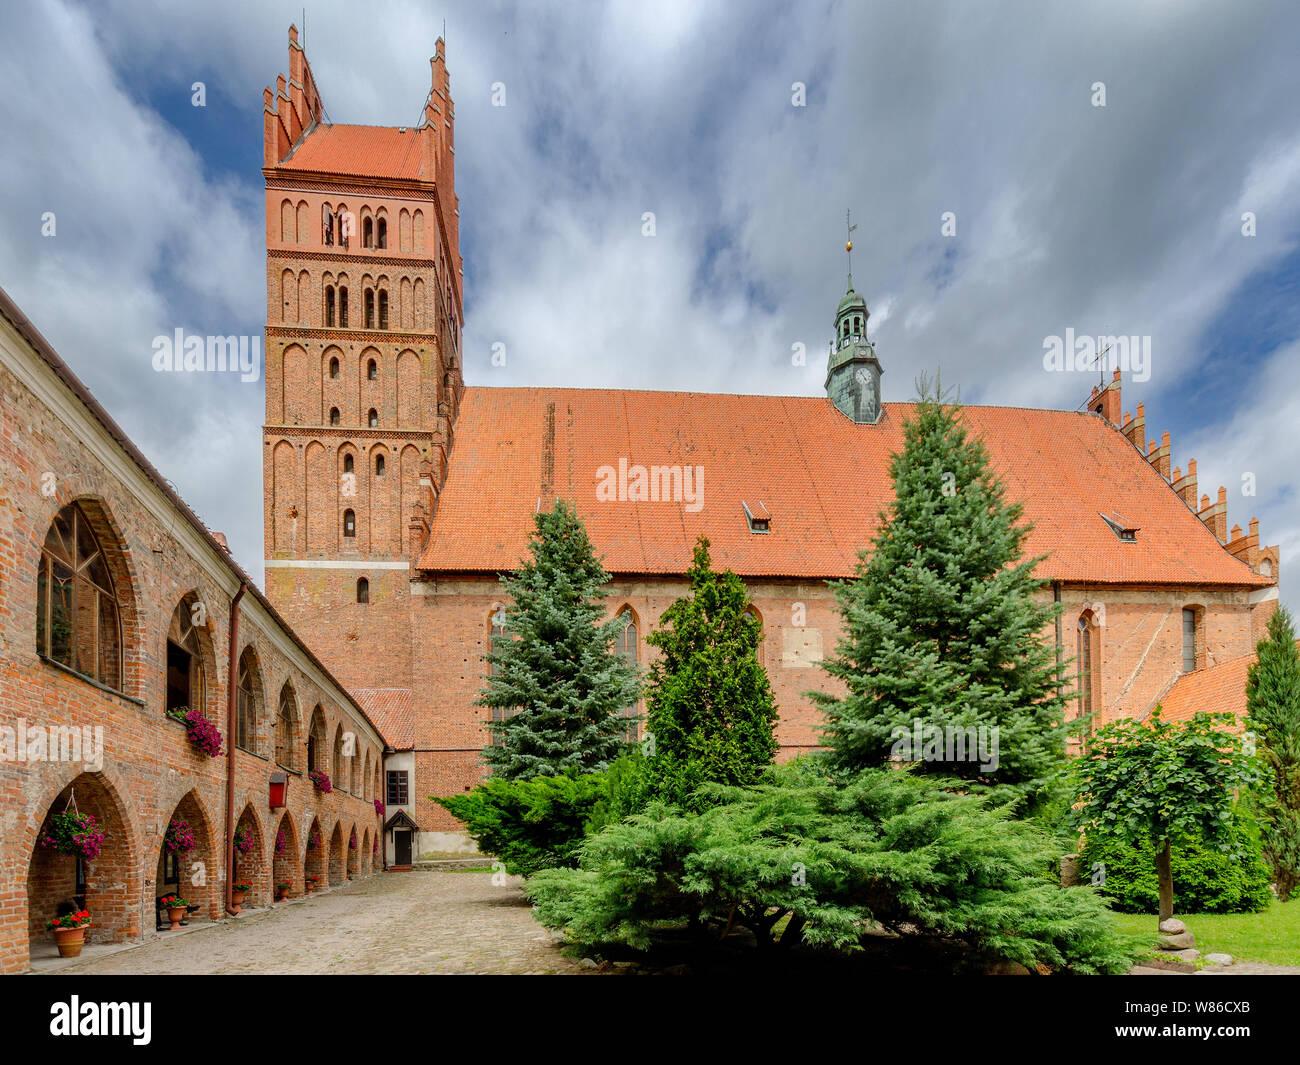 Dobre Miasto, ger. Guttstadt, warmian-mazurian province, Poland. 14th cent. collegiate church of the Holy Saviour and All Saints,  basilica minor. Stock Photo